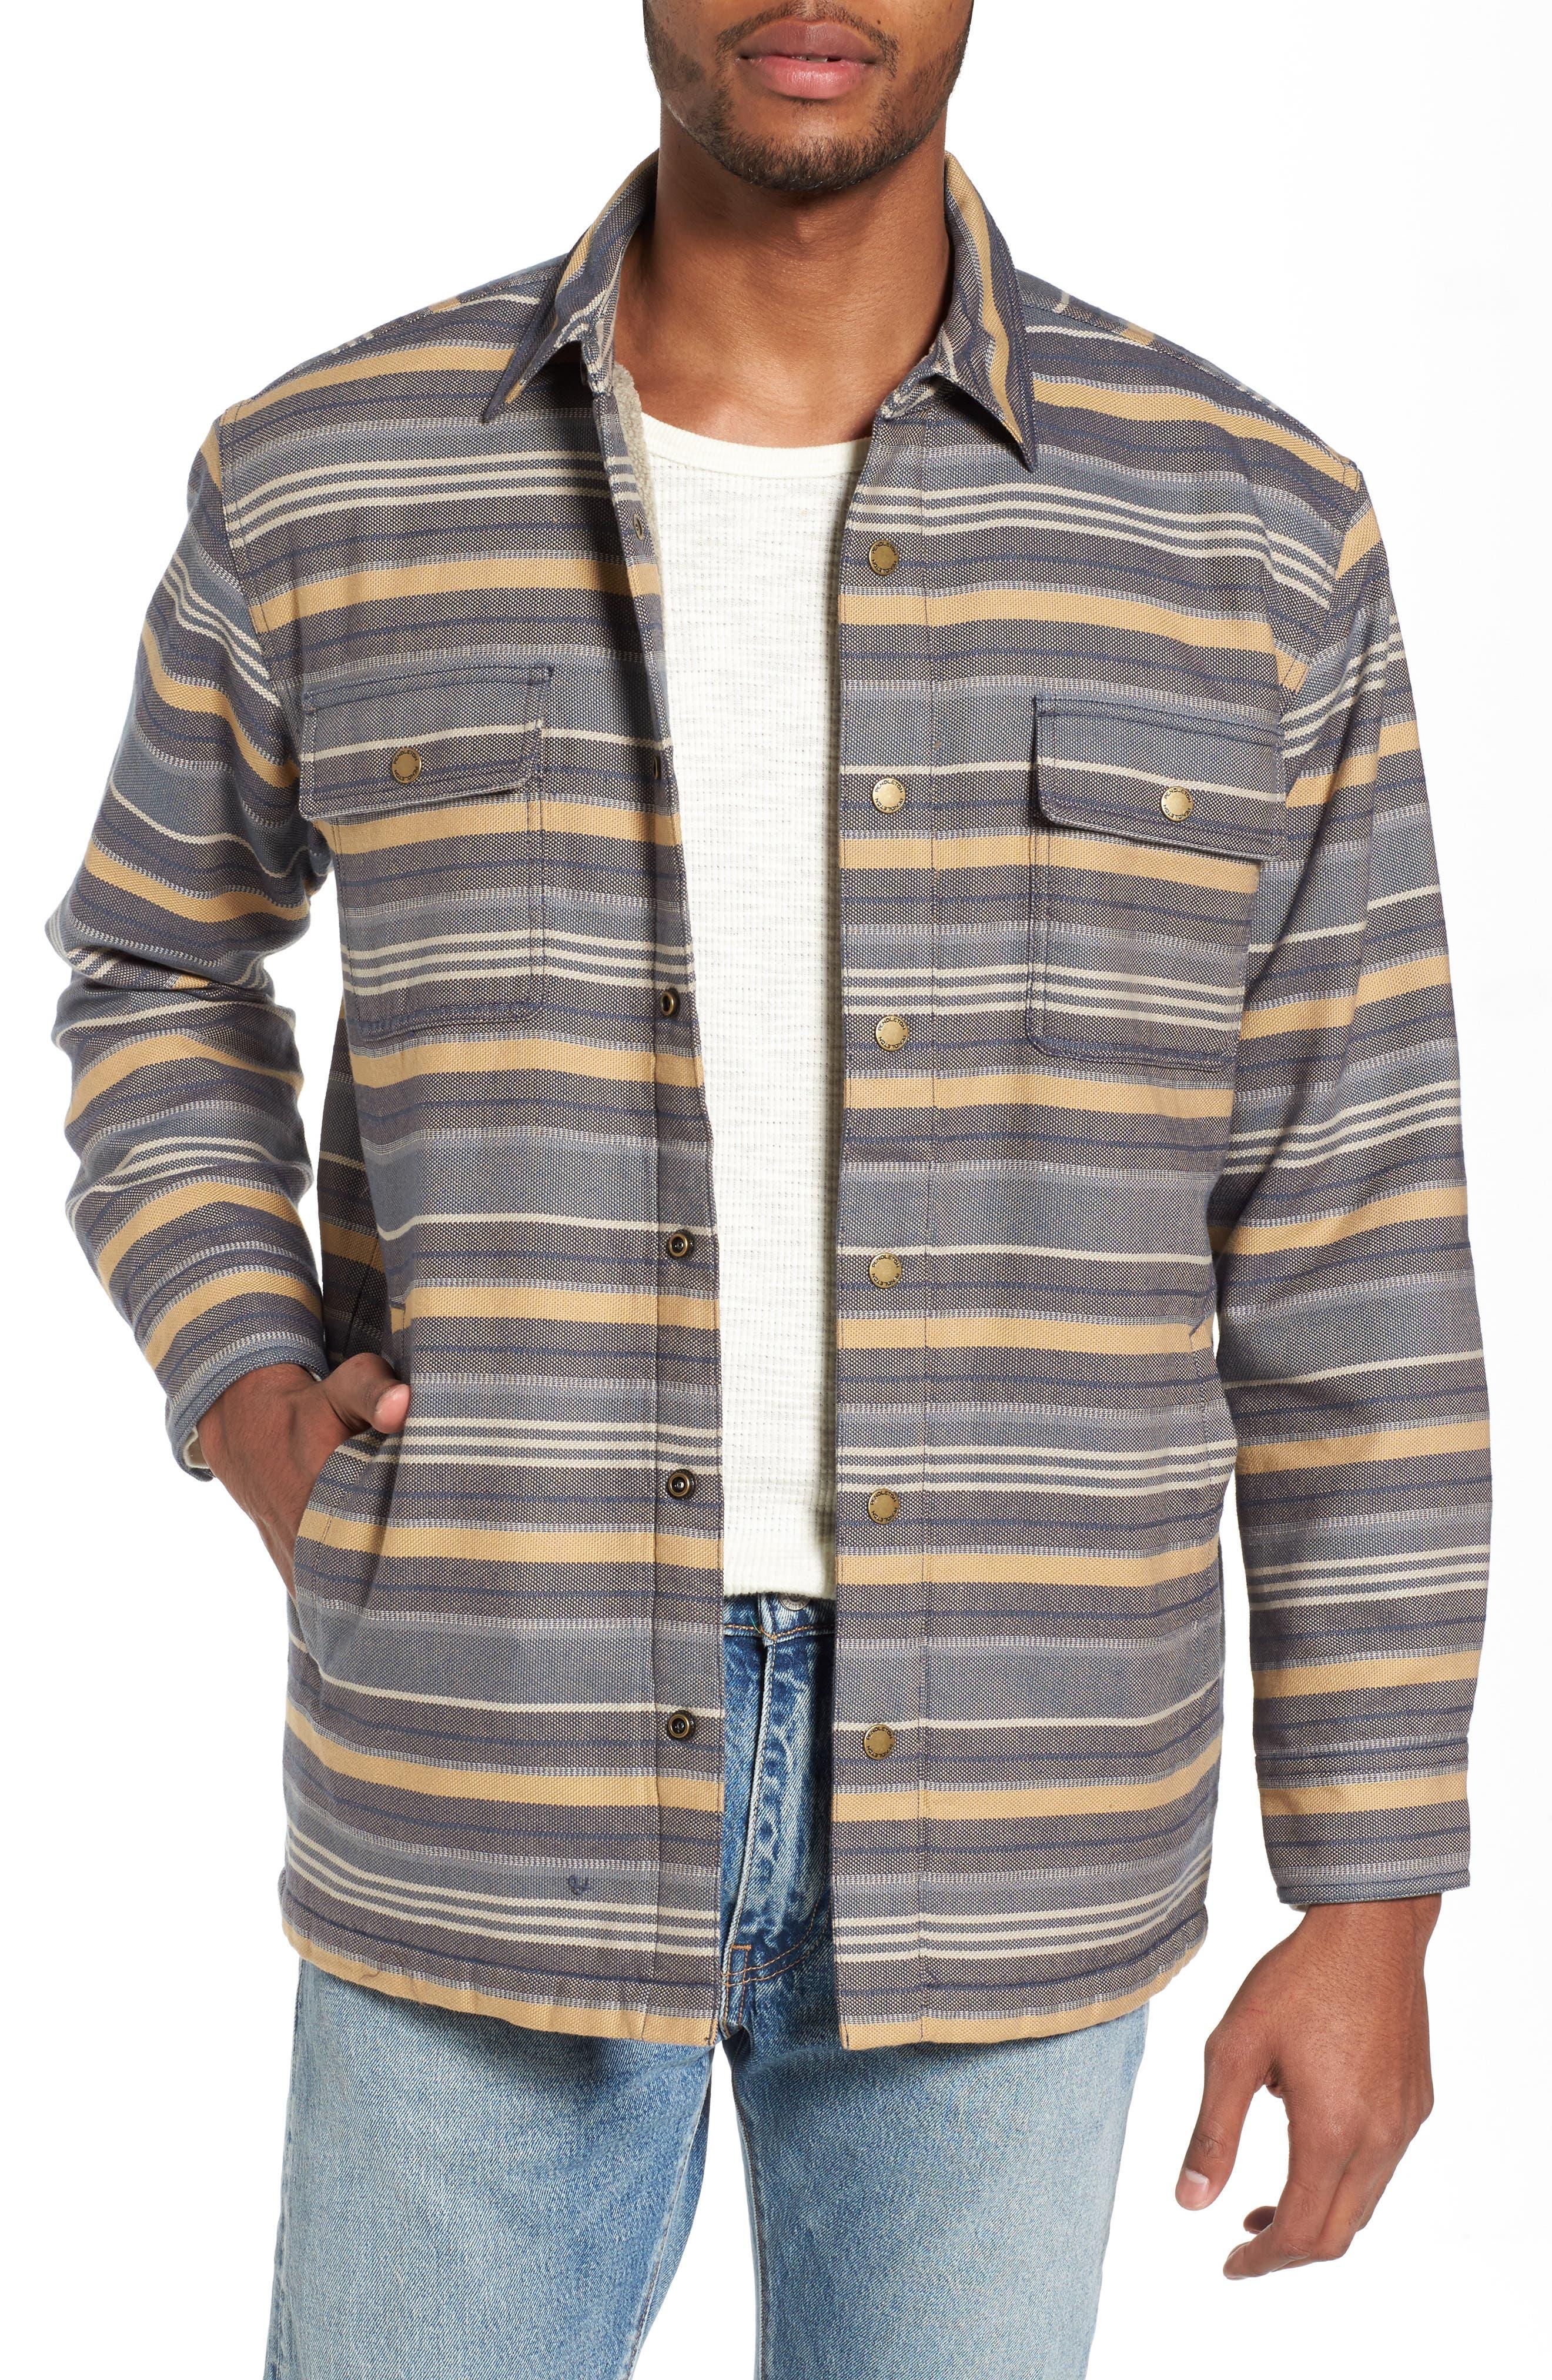 Pendleton Fleece Lined Shirt Jacket